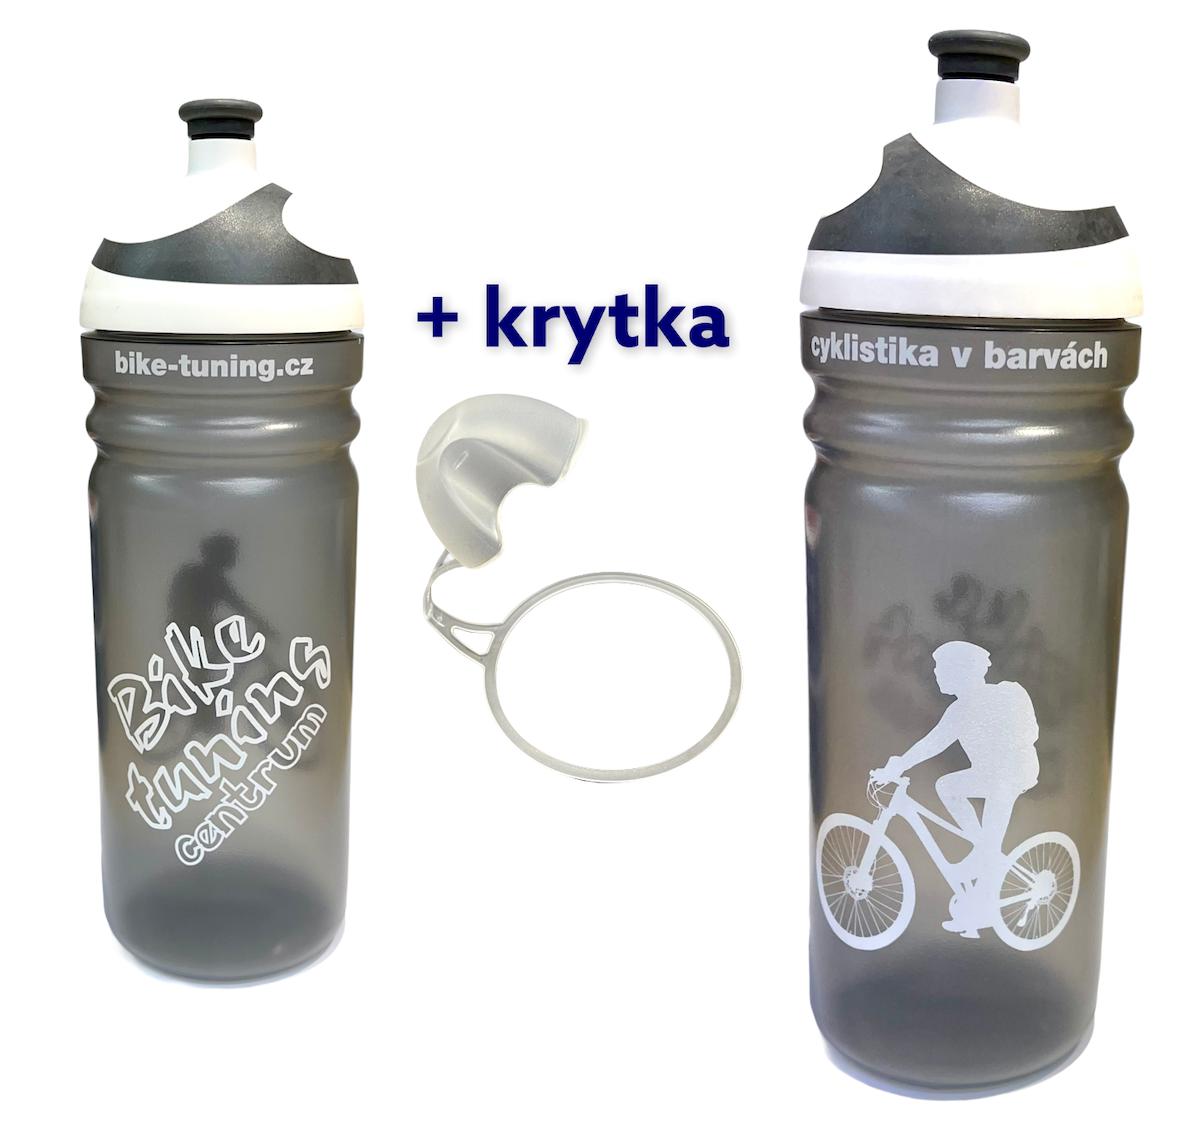 Láhev R&B 0,7L Bike tuning centrum Transparent bílé 2K víčko + krytka